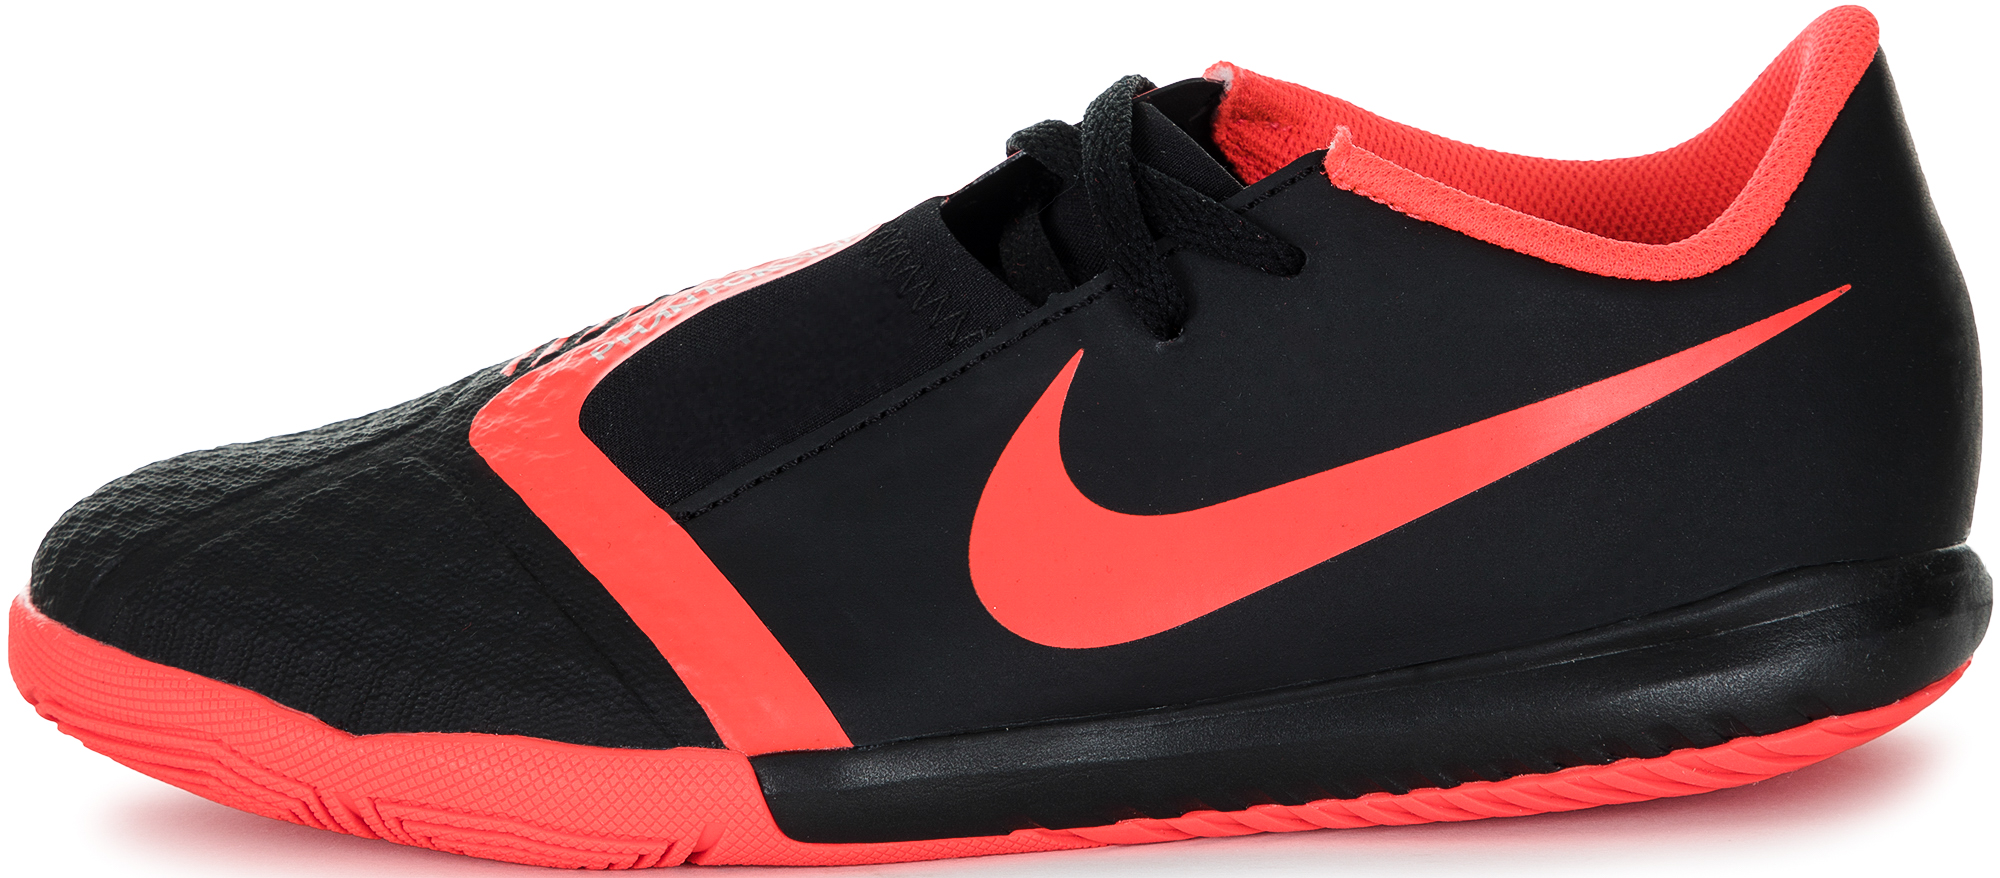 Nike Бутсы для мальчиков Nike Phantom Venom Academy IC, размер 37,5